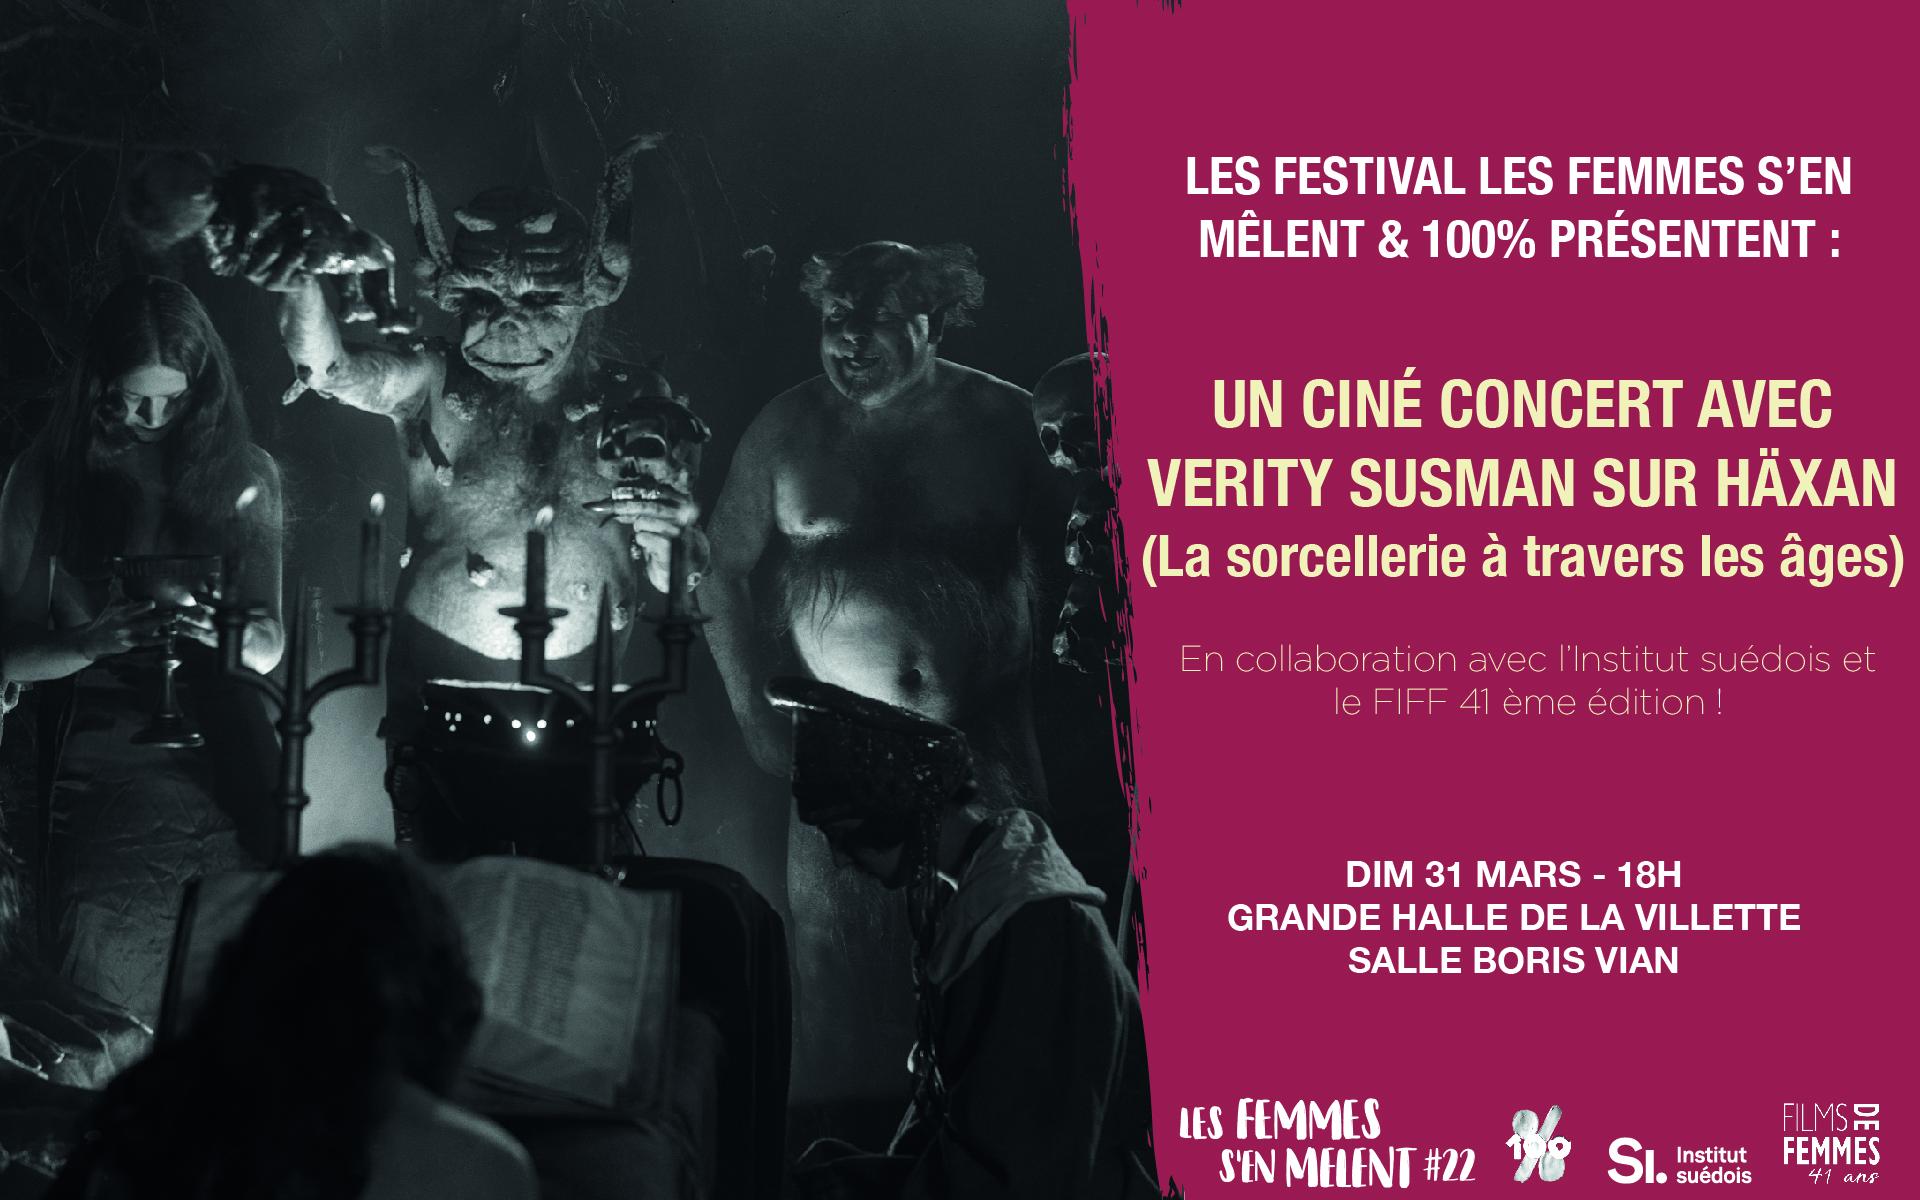 Häxan poster - Paris 2019.jpg